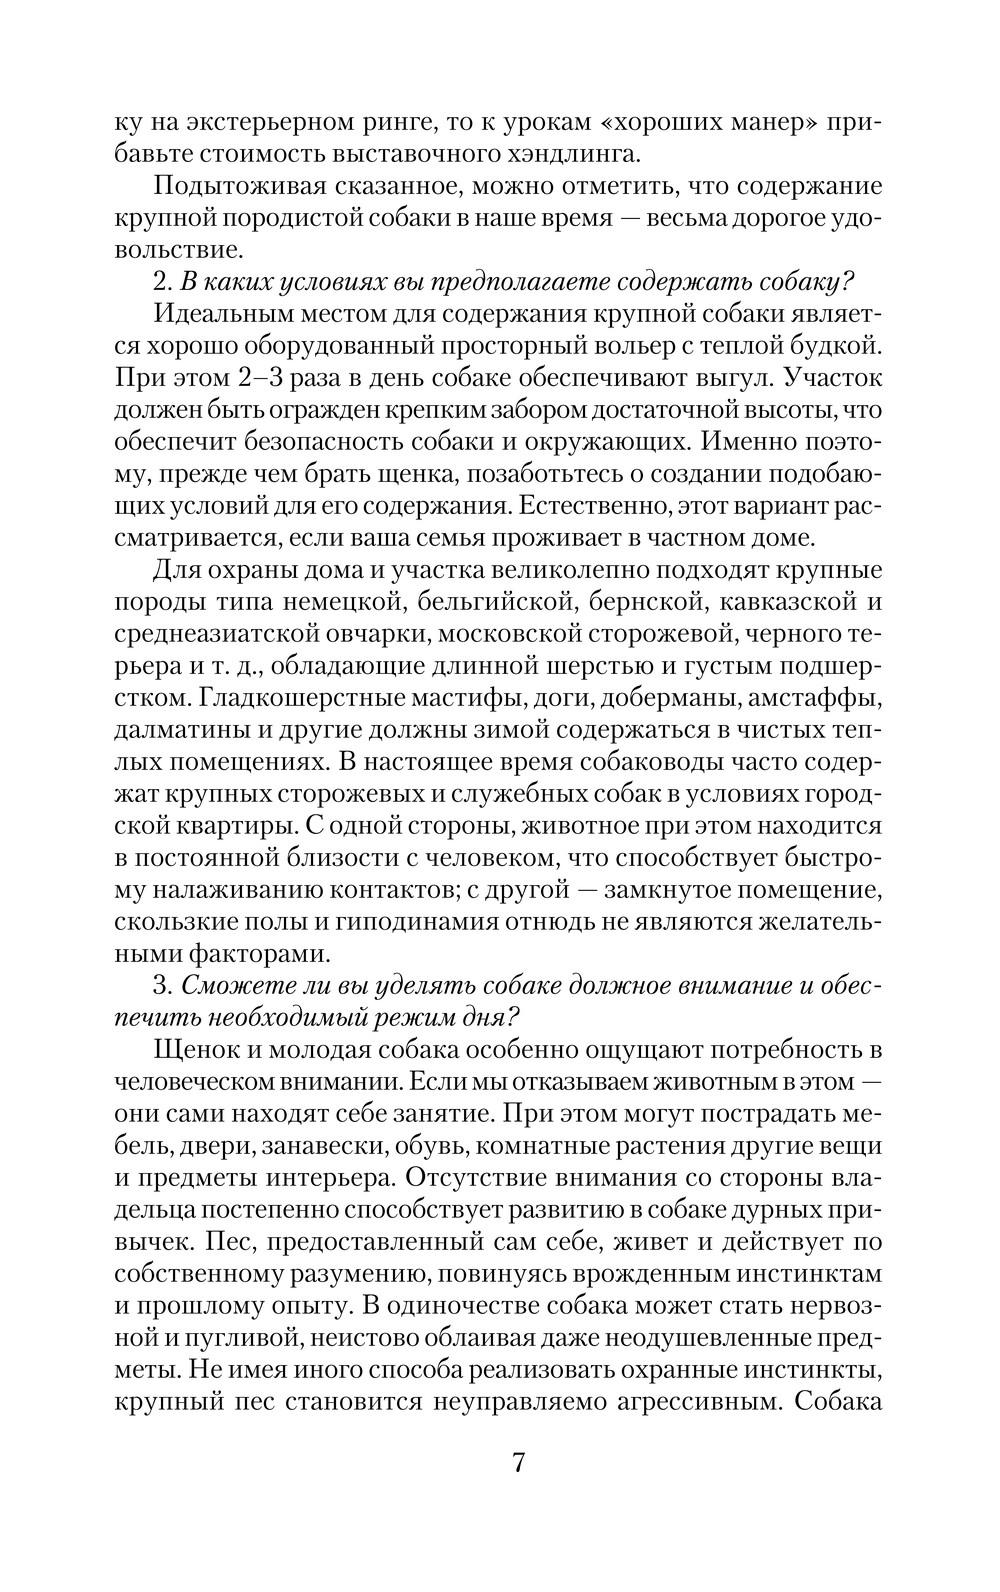 http://i6.imageban.ru/out/2014/01/12/cc6a5c2810b94be4b48325f3e01766a9.jpg